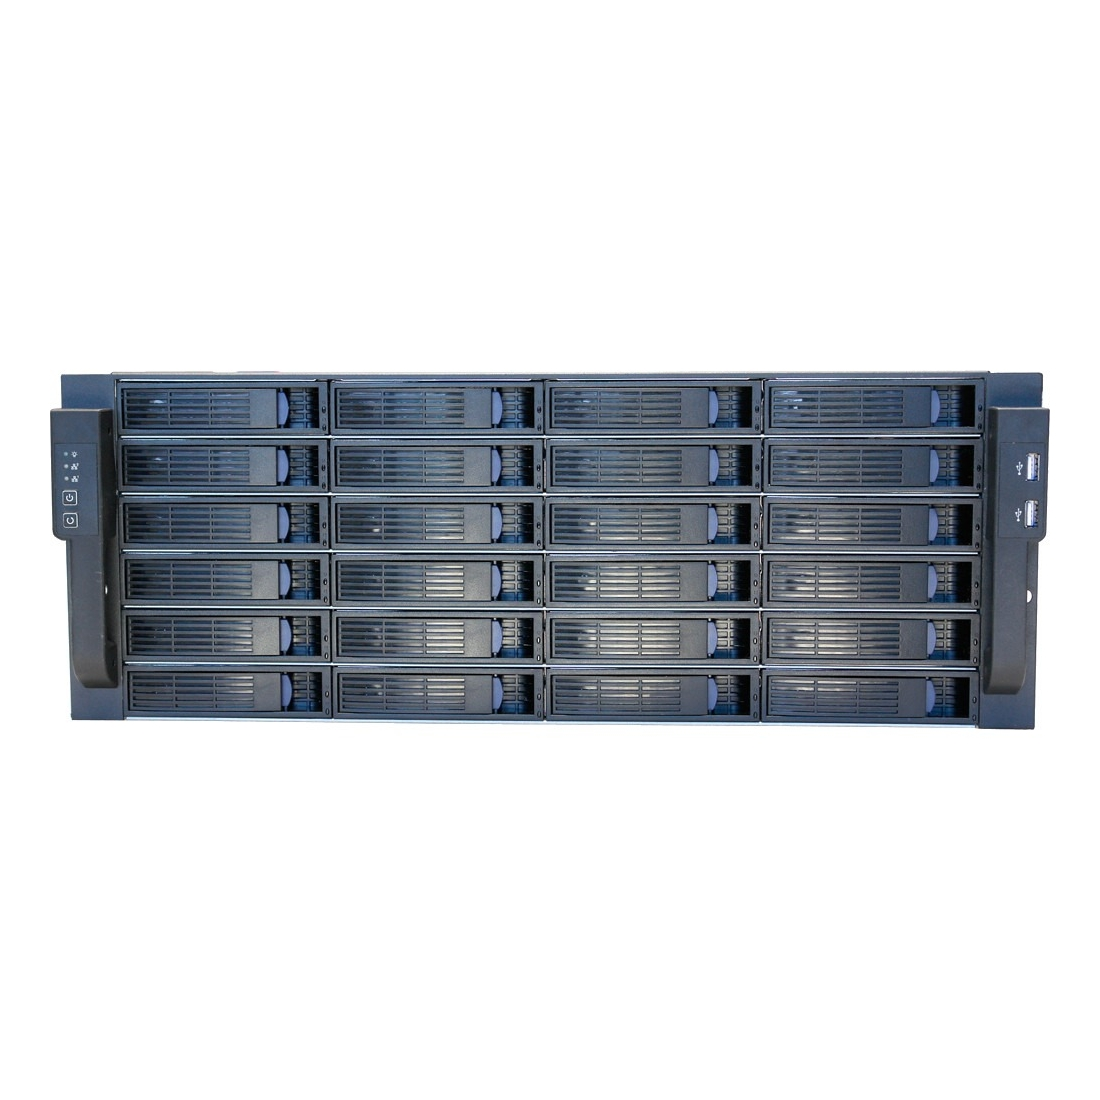 "Norco 4u Rackmount Server Case W/24 Hot-swappable Sata/sas Drive Bays - Rack-mountable - 4u - 24 X Bay - 6 X 3.15"" X Fan[s] Installed - Ssi Eeb, Ssi Ceb, Atx, Micro Atx, Mini Itx Motherboard (104850)"